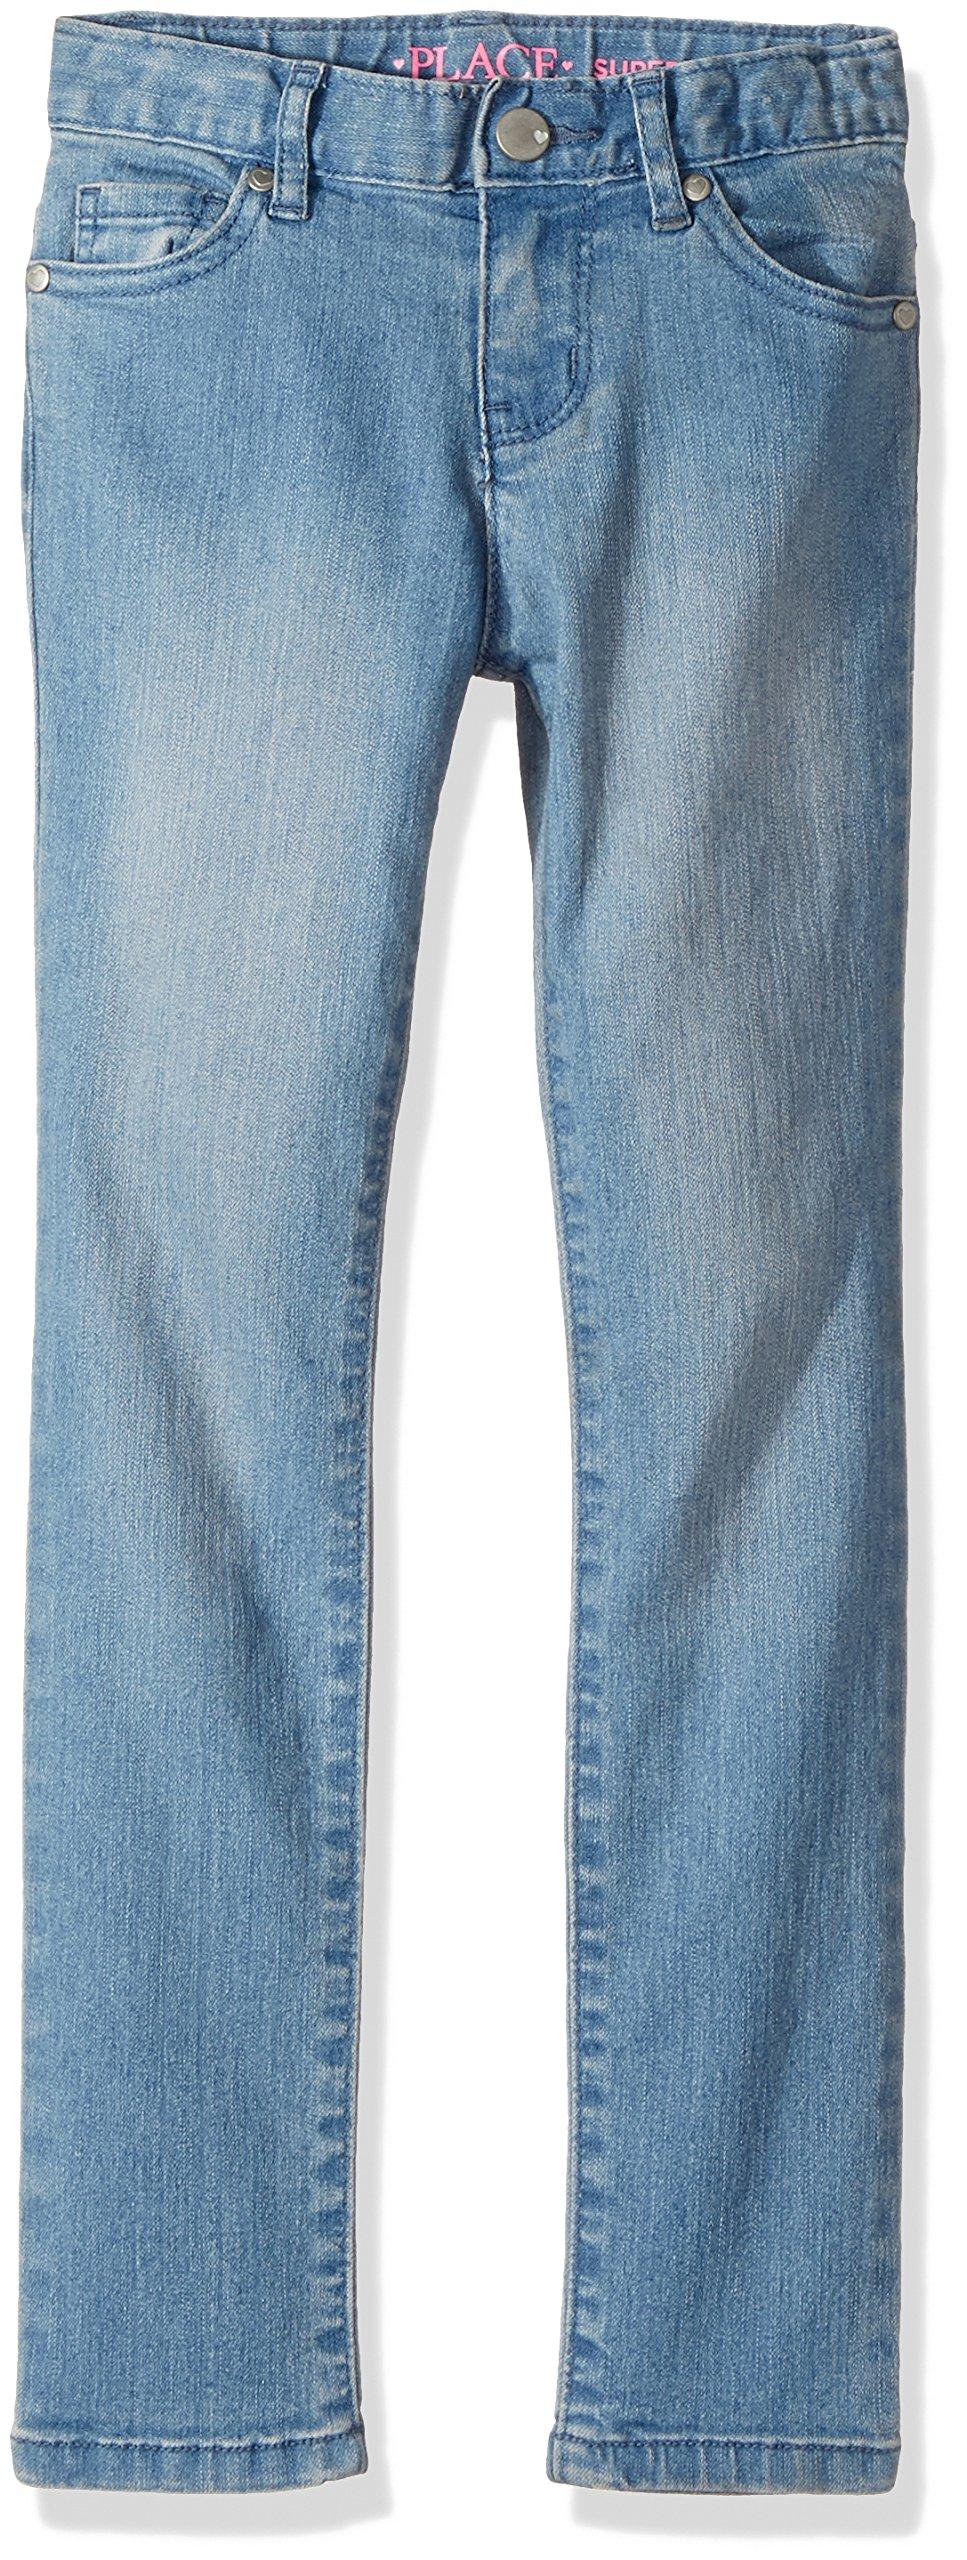 The Children's Place Big Girls' Skinny Jeans, Light